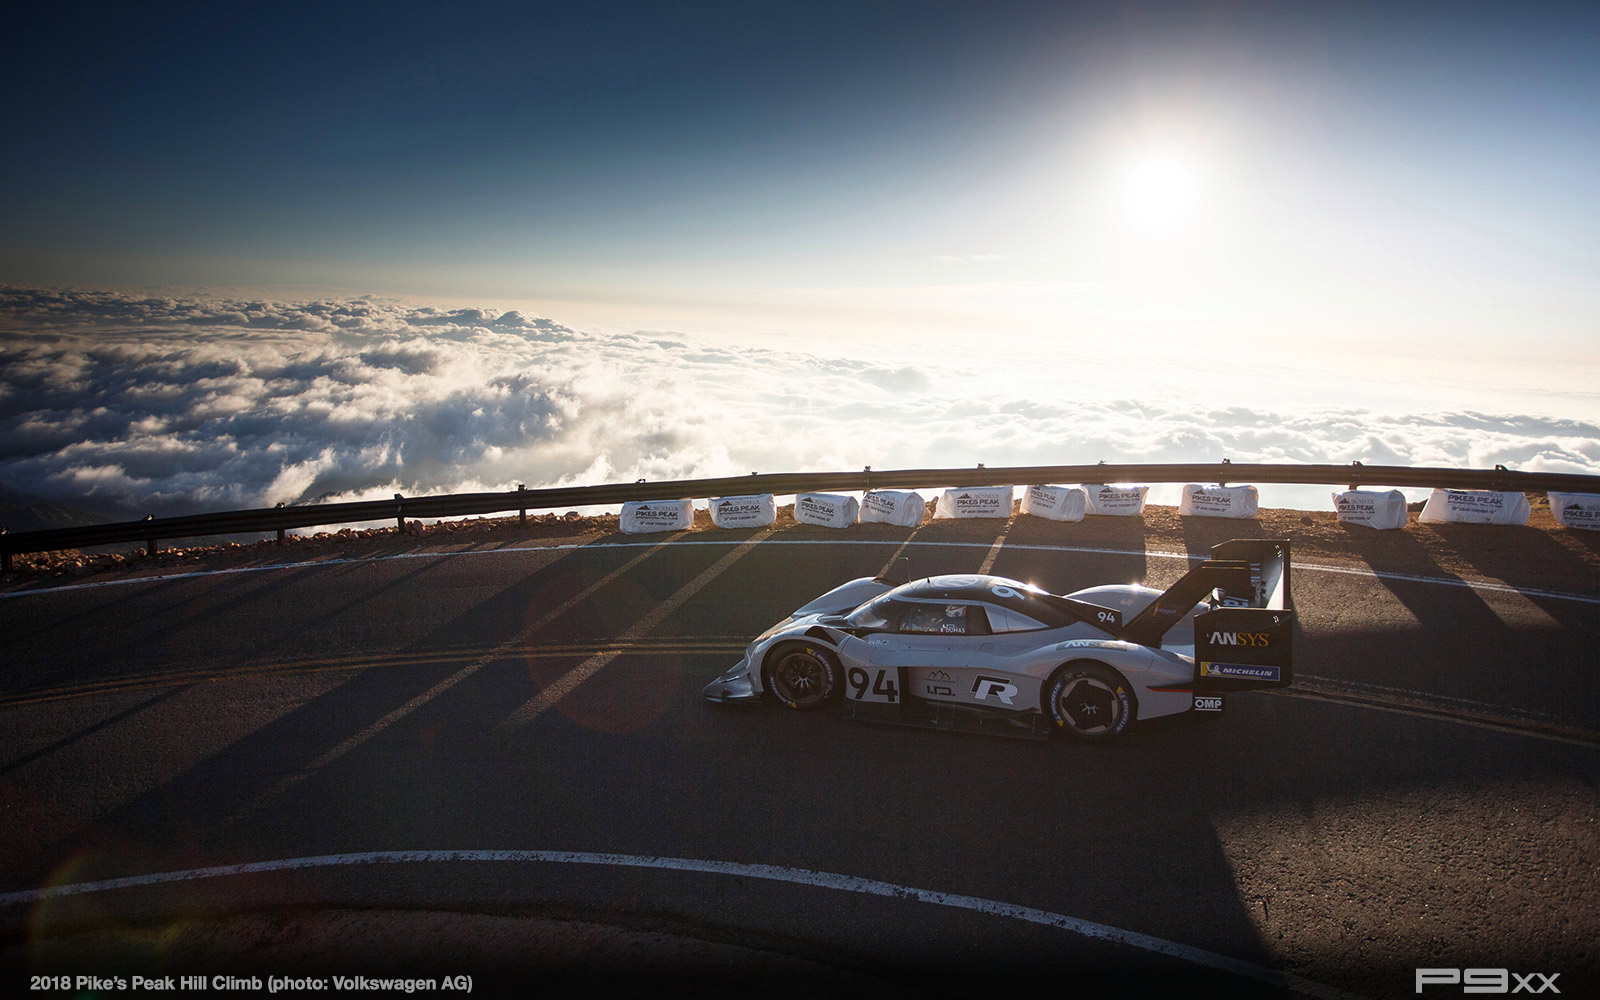 2018-Pikes-Peak-Volkswagen-IDR-308